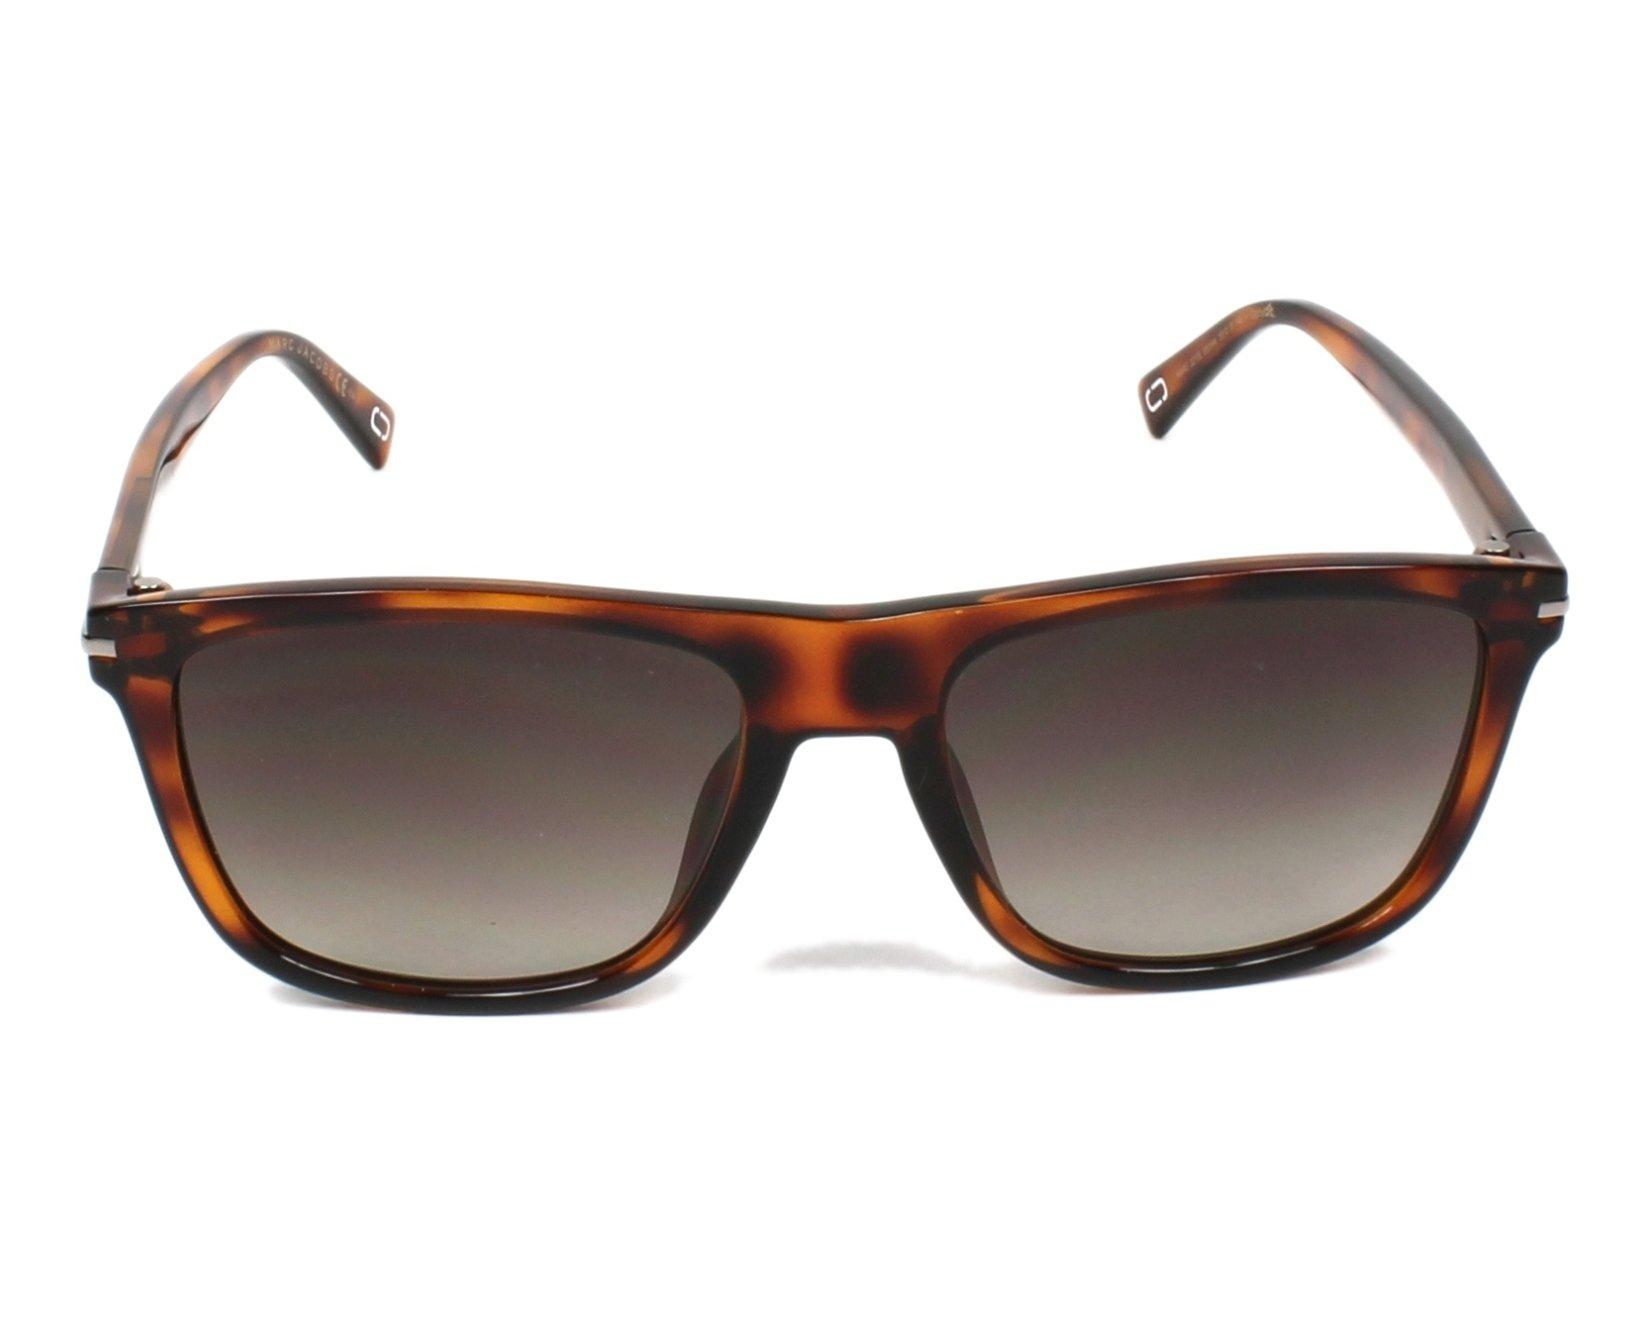 Sunglasses Marc Jacobs MARC-221-S 581 HA 55-18 Havana front 54c6eca92ece